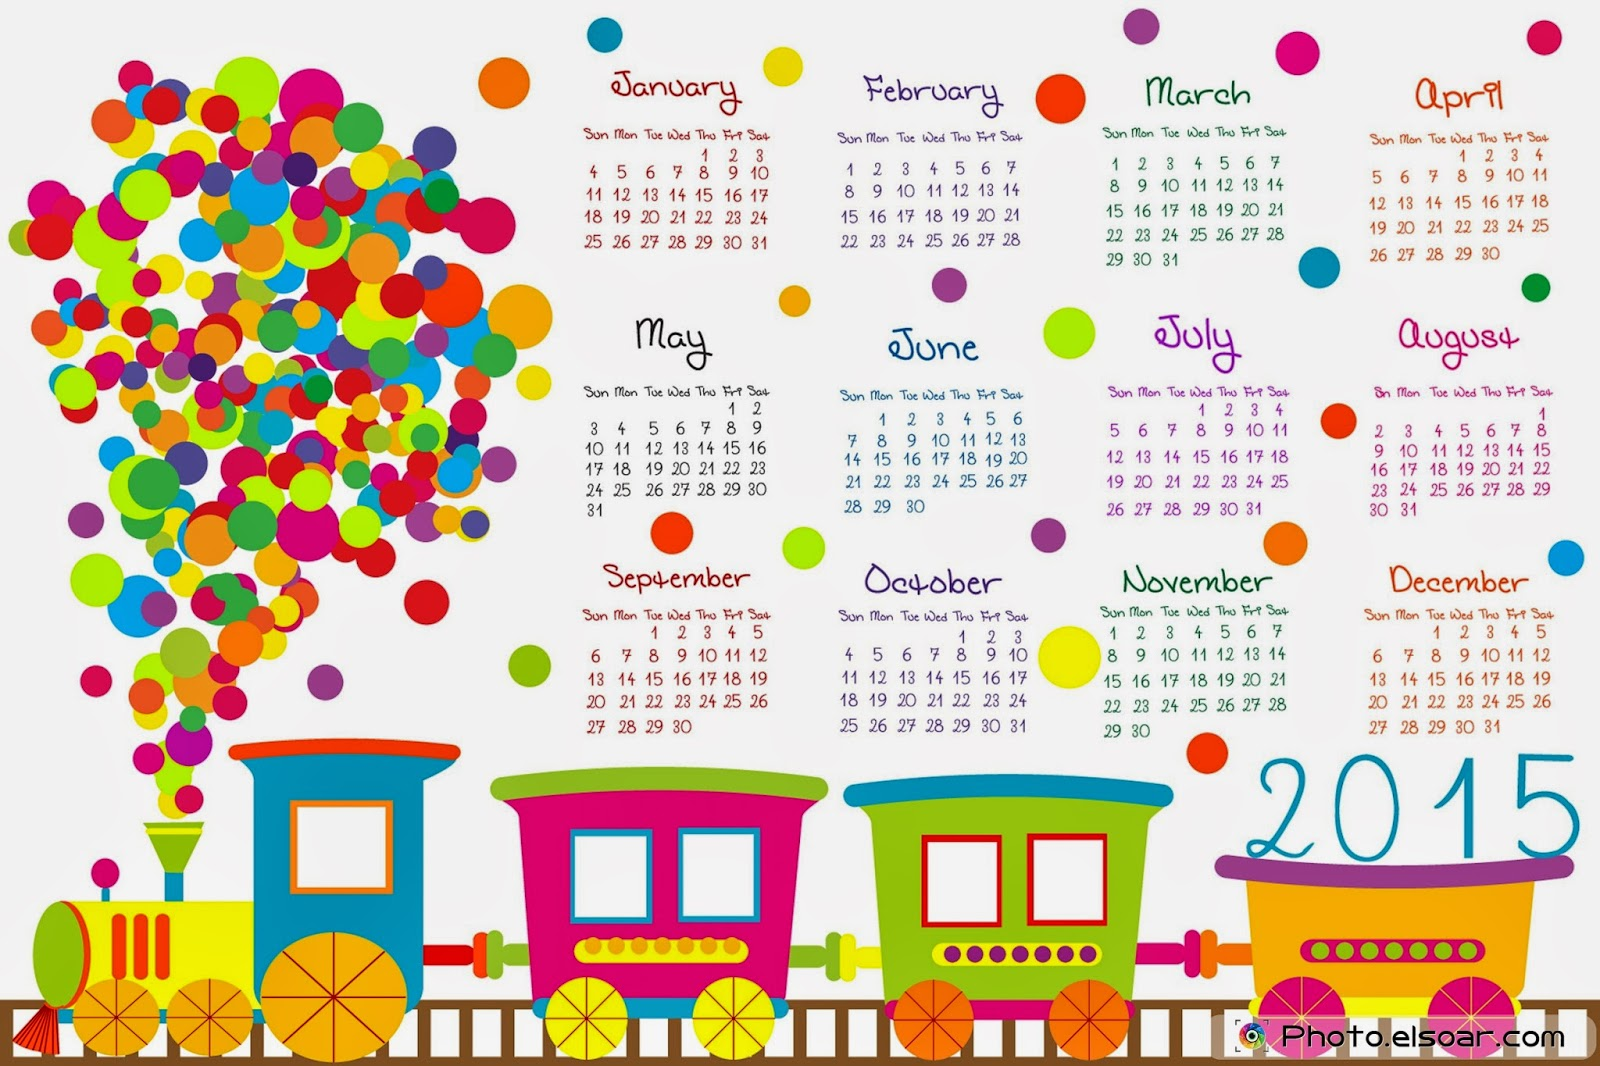 2015 Calendar Ready to Print | Png Vectors, Photos | Free Download